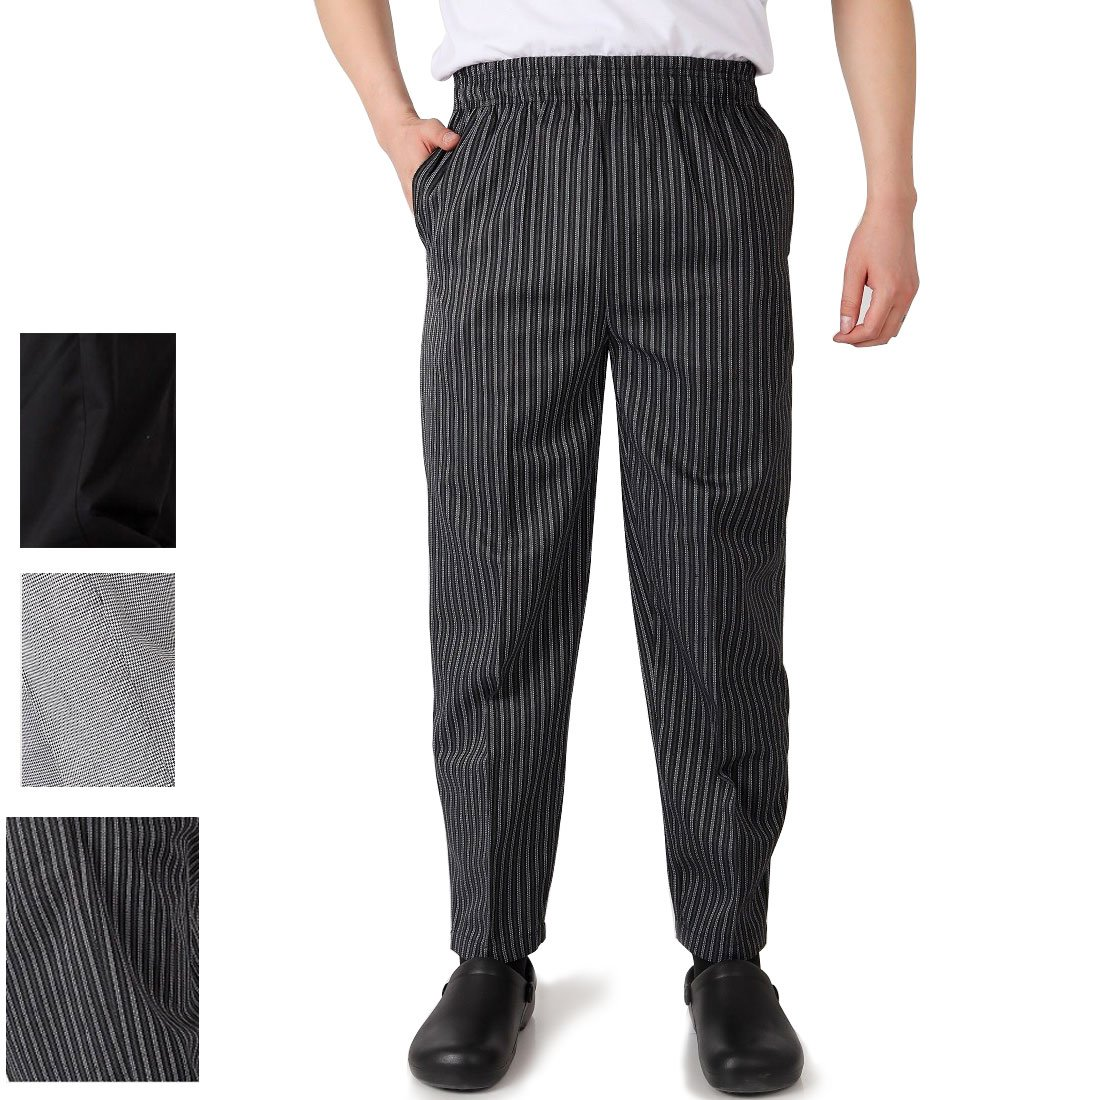 Levoberg Chef Pant Elastic Waist with Pocket Men's Baggy Chef Pant Restaurant Hotel Work Uniforms 2XL Stripe